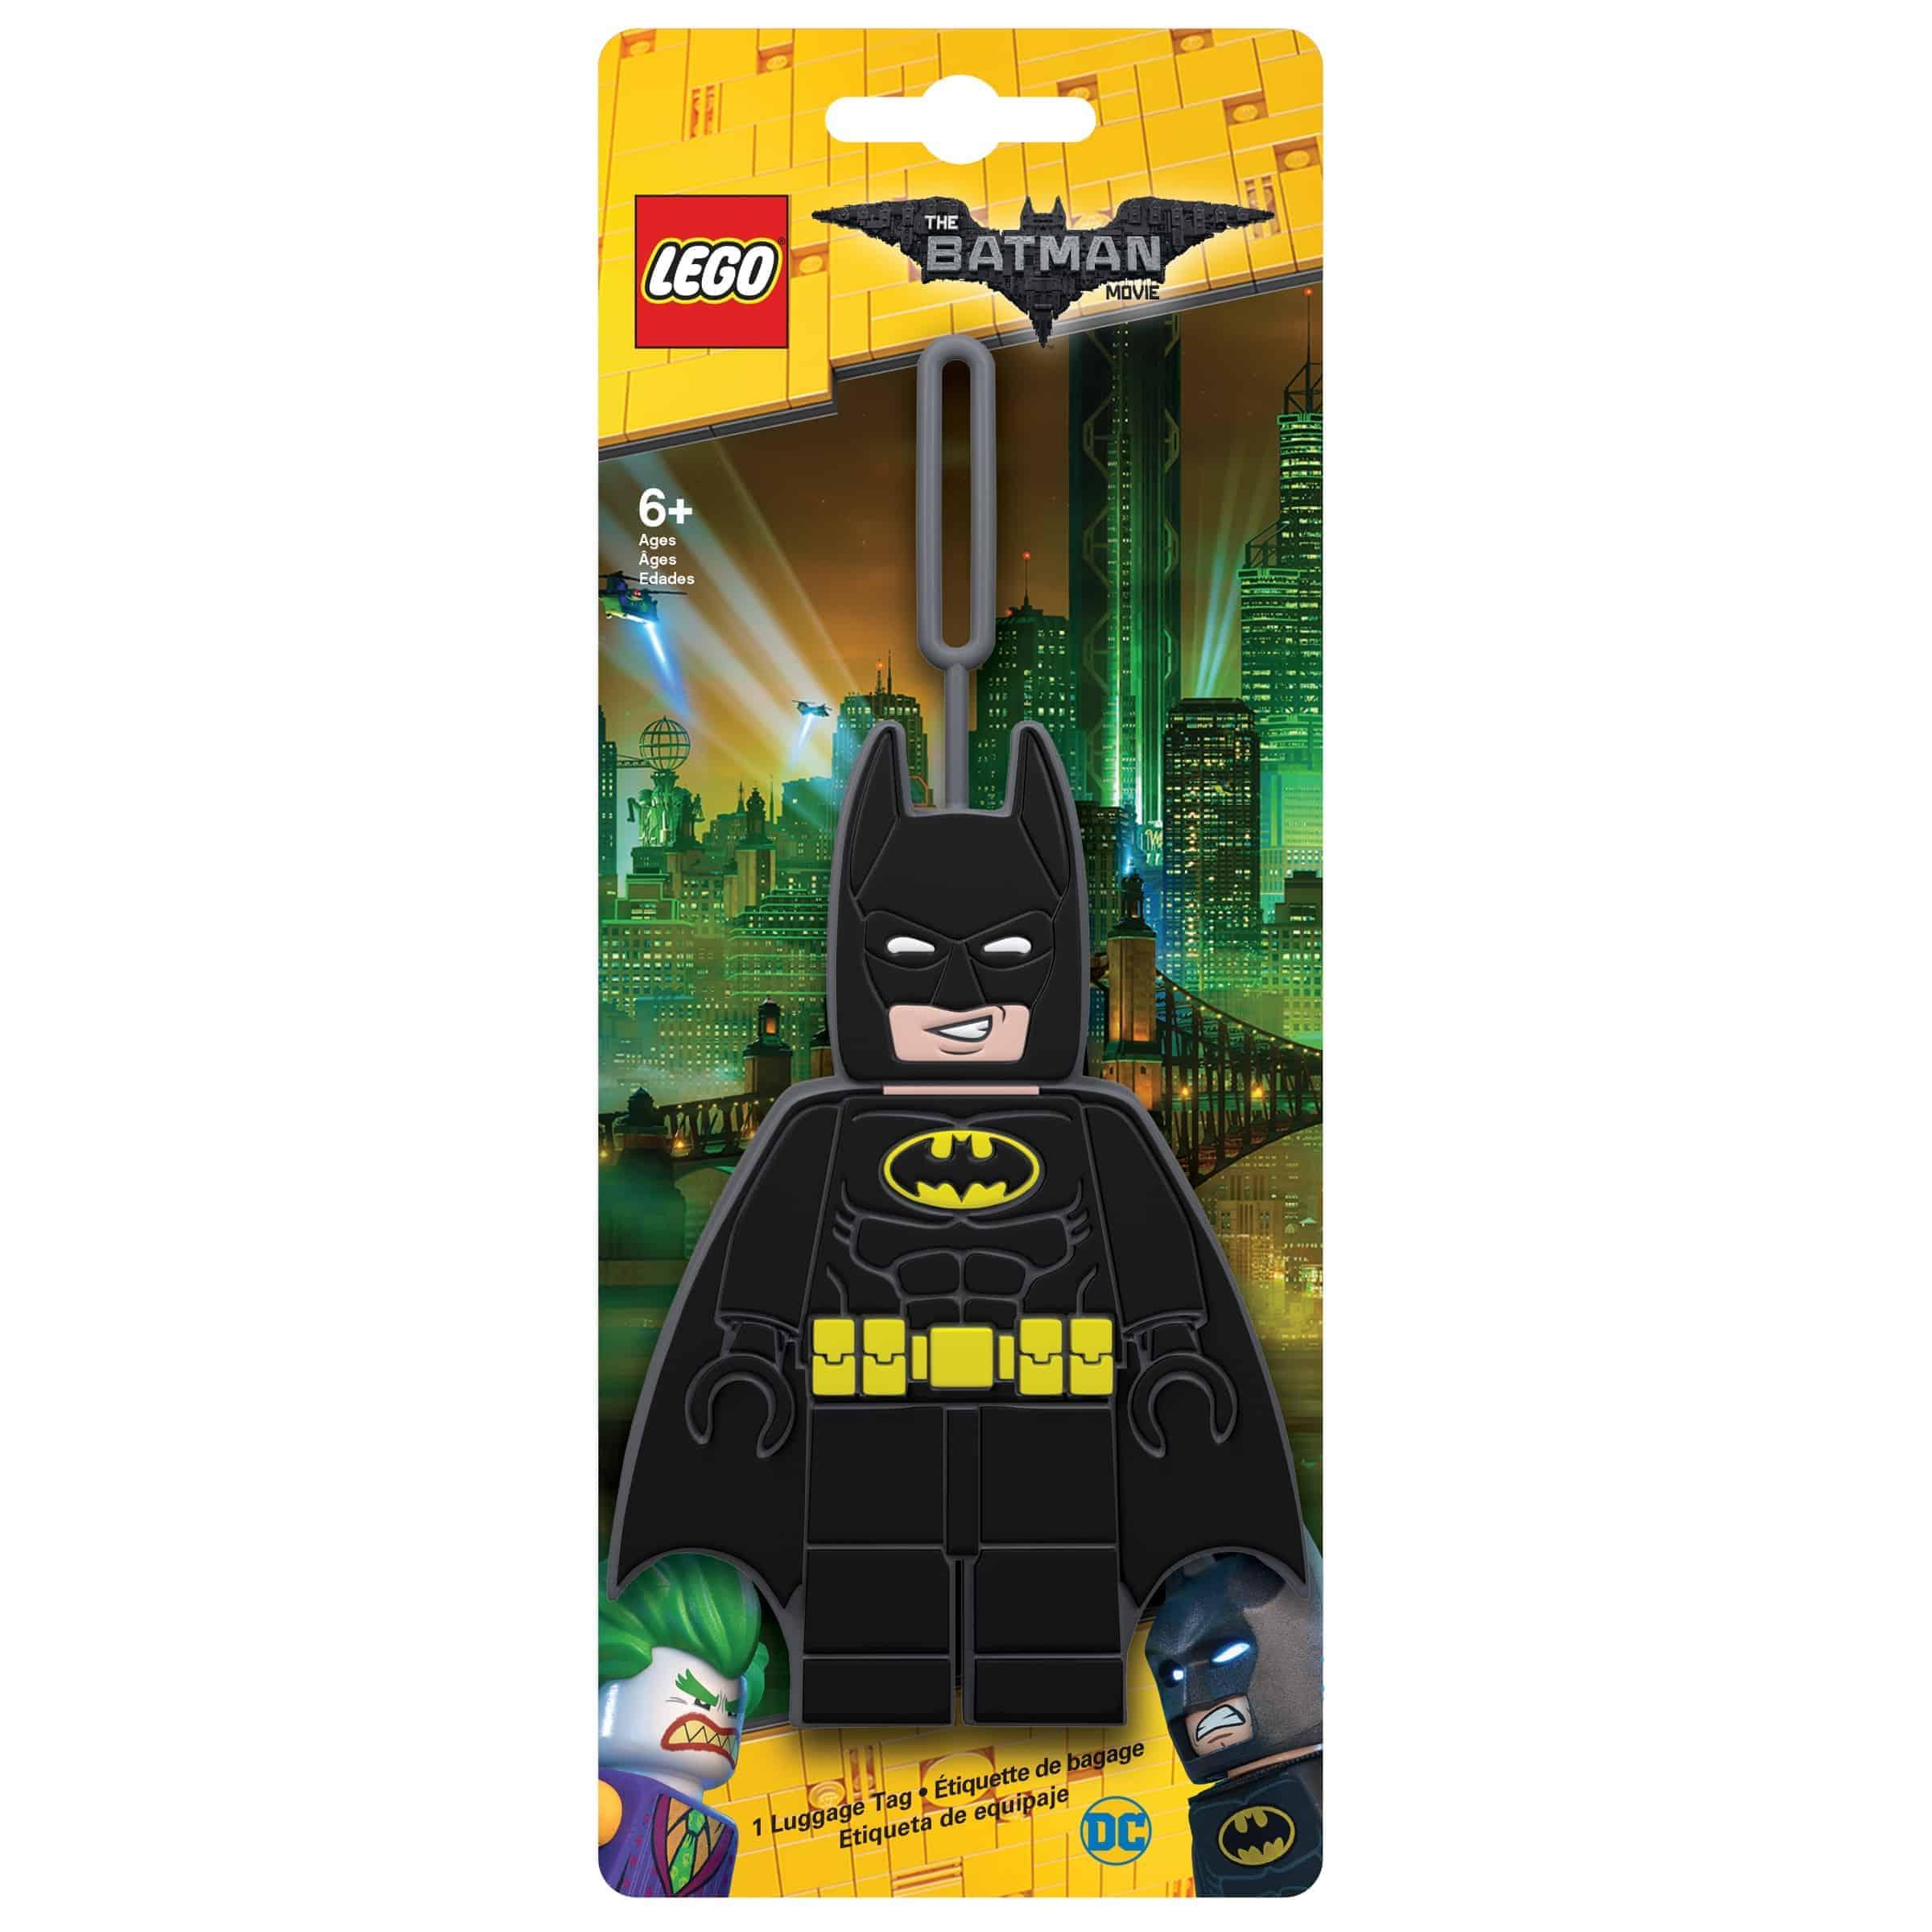 lego 5005273 batman movie gepaeckanhaenger